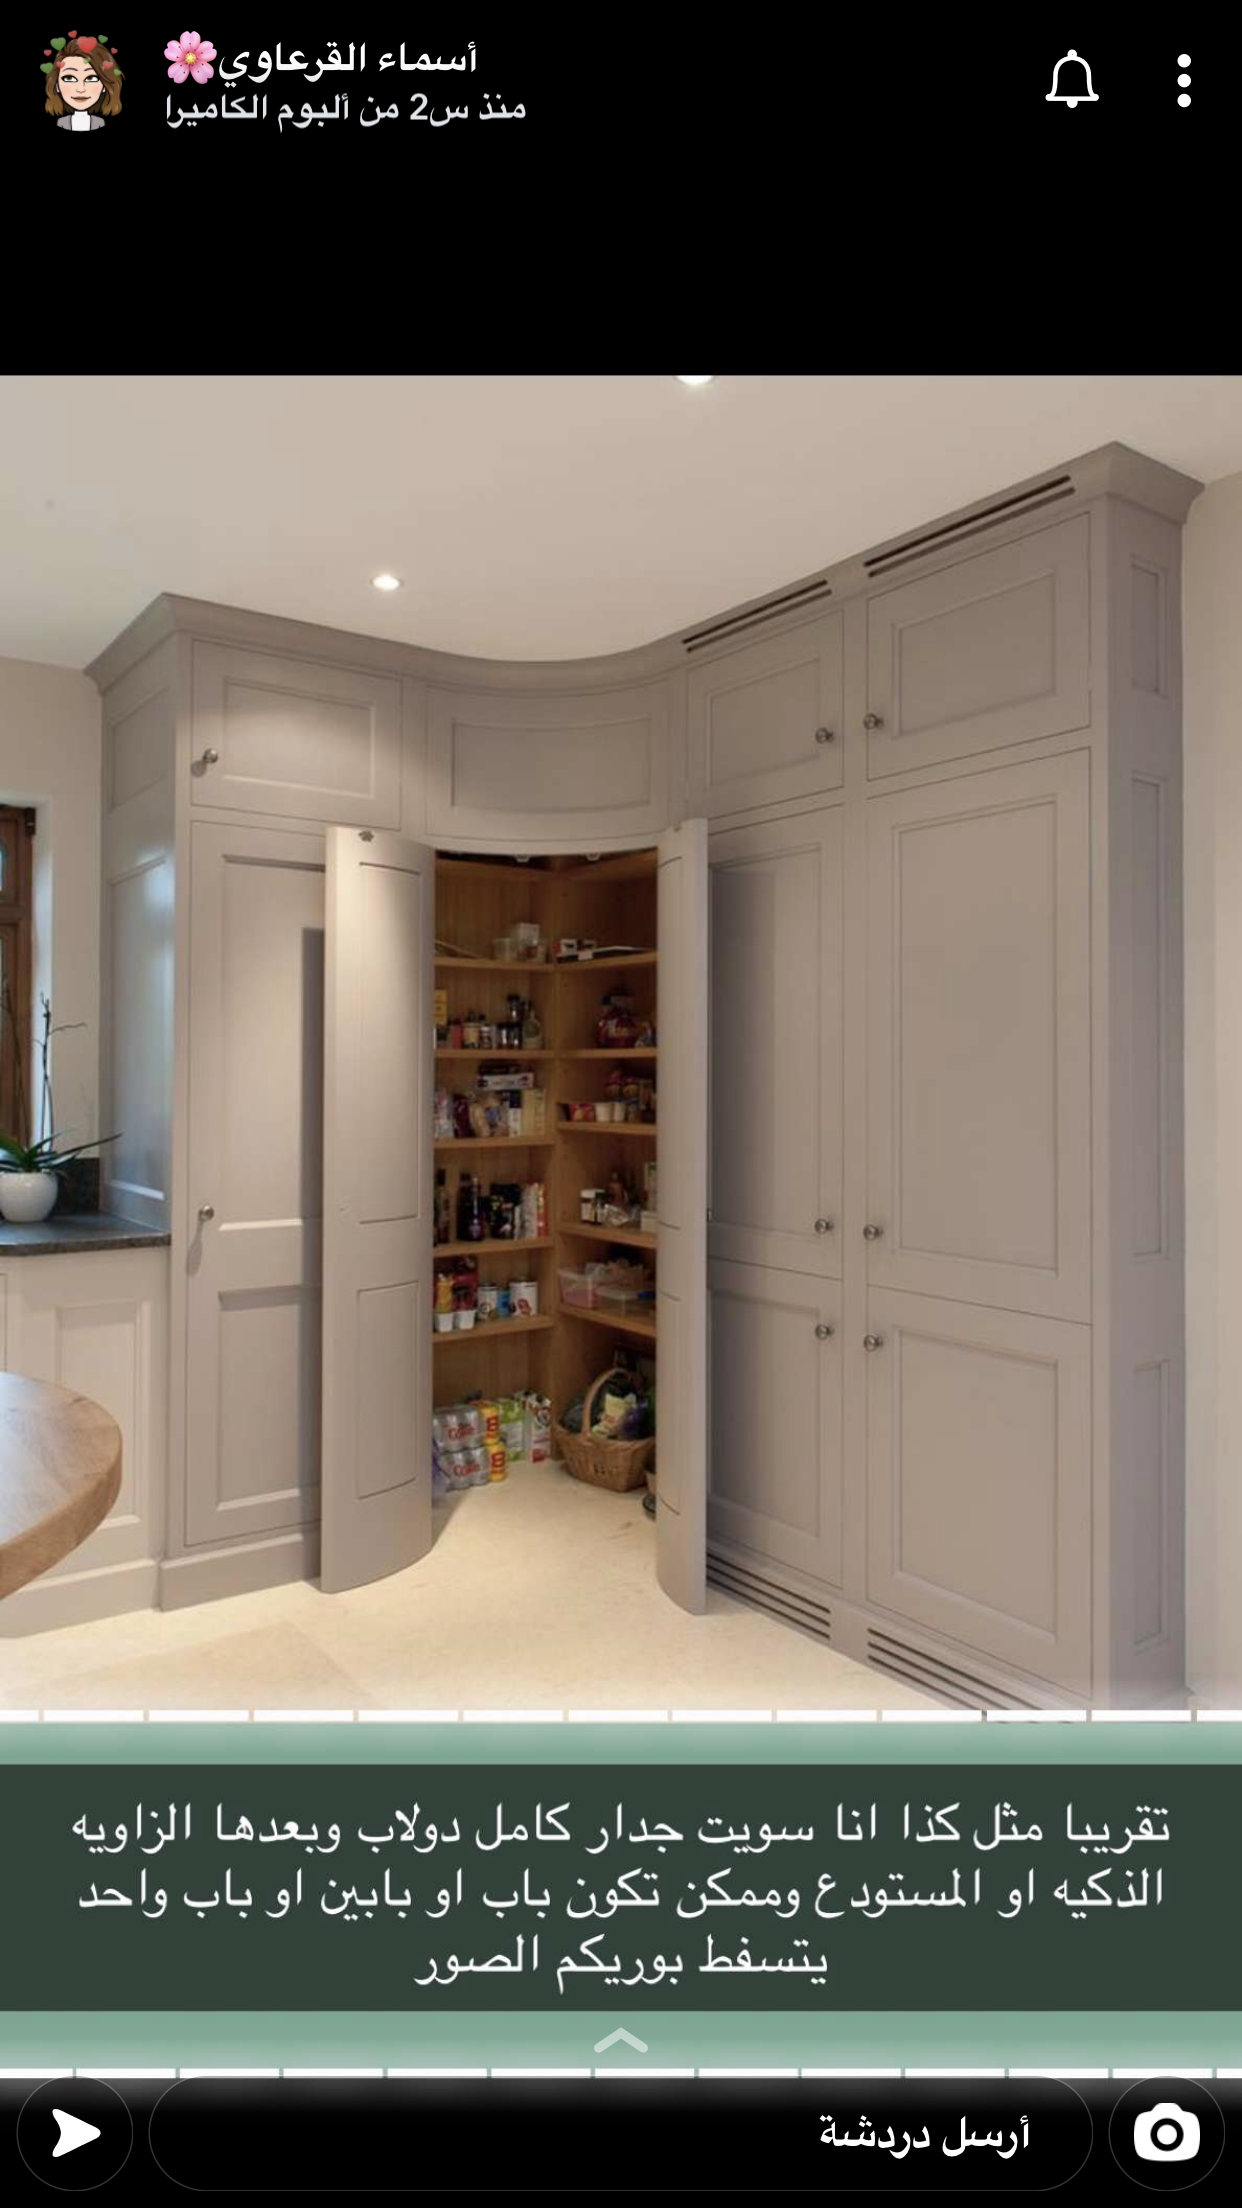 Pin By زينه On أفكار تصميم مدرسيه مطبخ اثاث Kitchen Design Modern Small Interior Design Dining Room Kitchen Ceiling Design